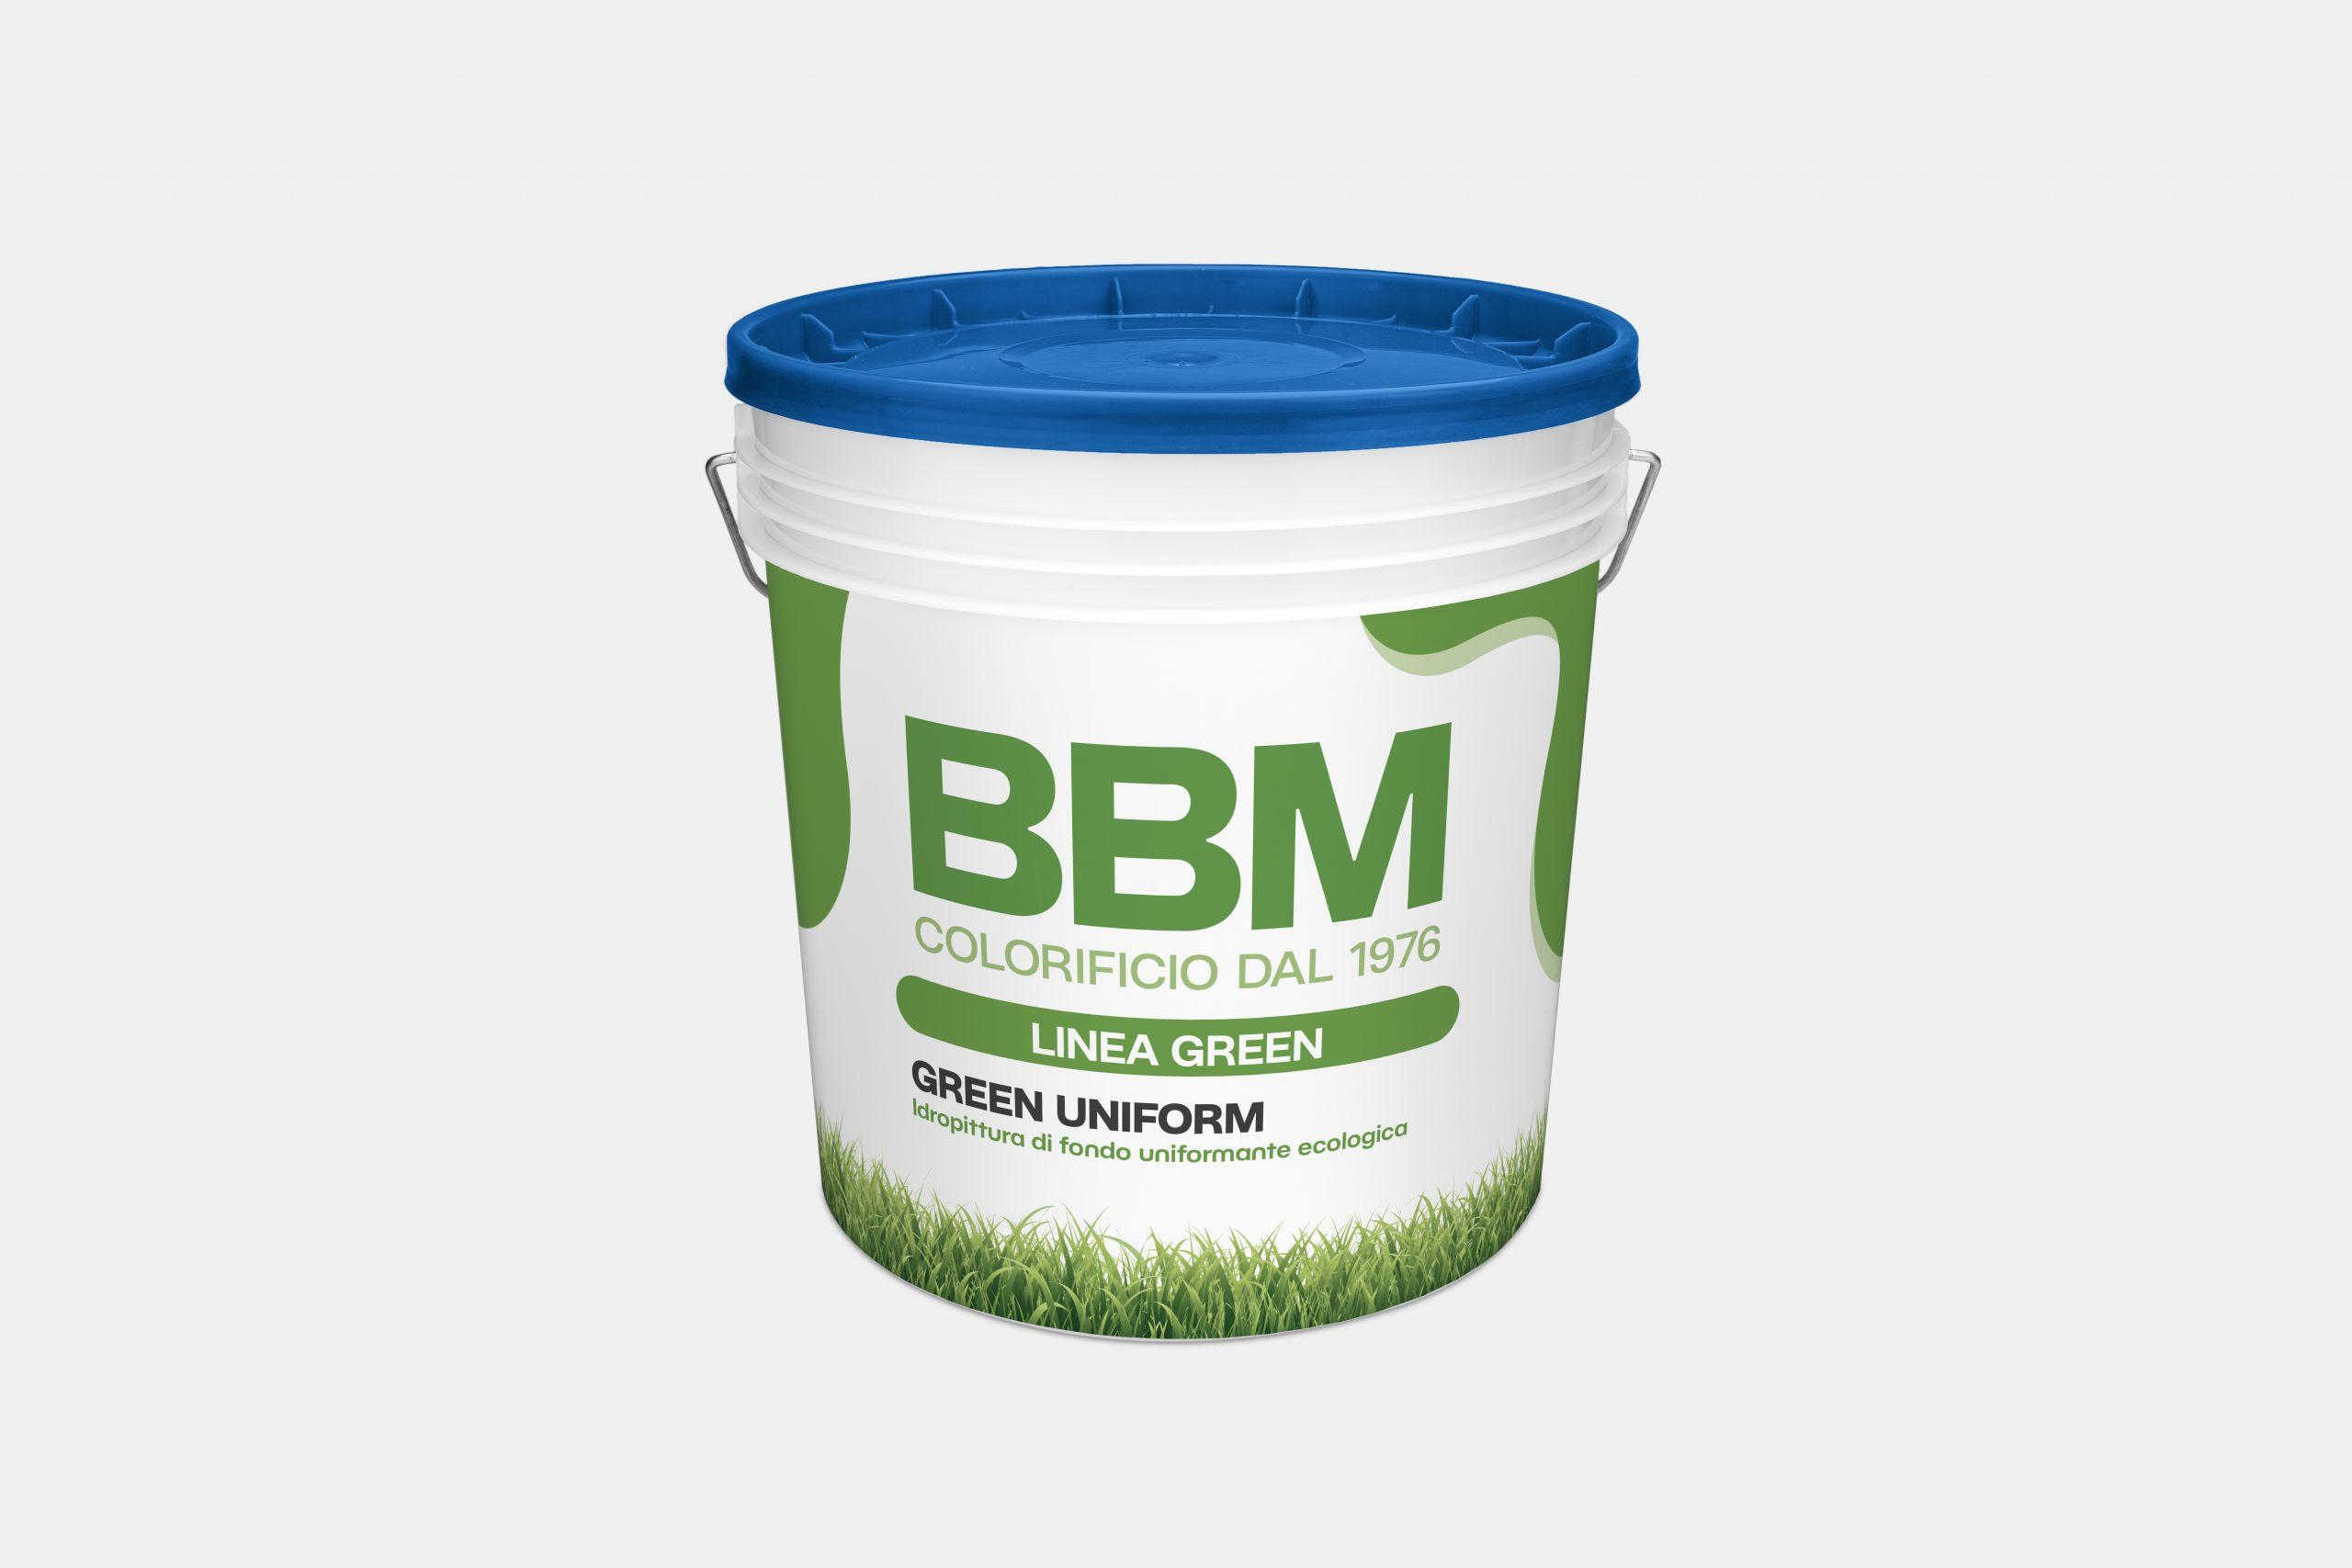 https://bbm-colorificio.it/wp-content/uploads/2021/07/Green-uniform-1-scaled.jpg